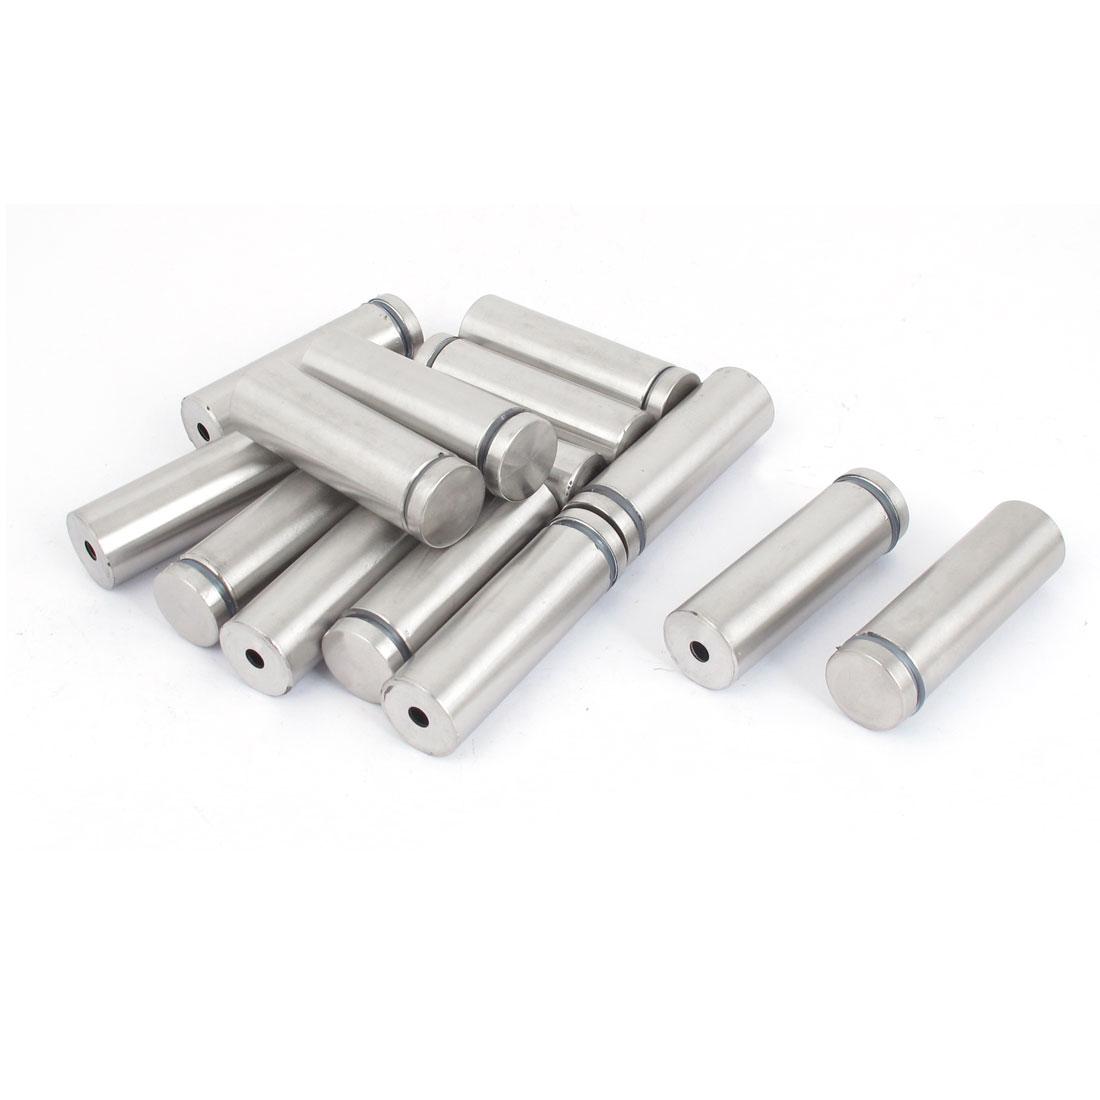 19mm x 60mm Stainless Steel Advertising Frameless Glass Standoff Pins 14pcs